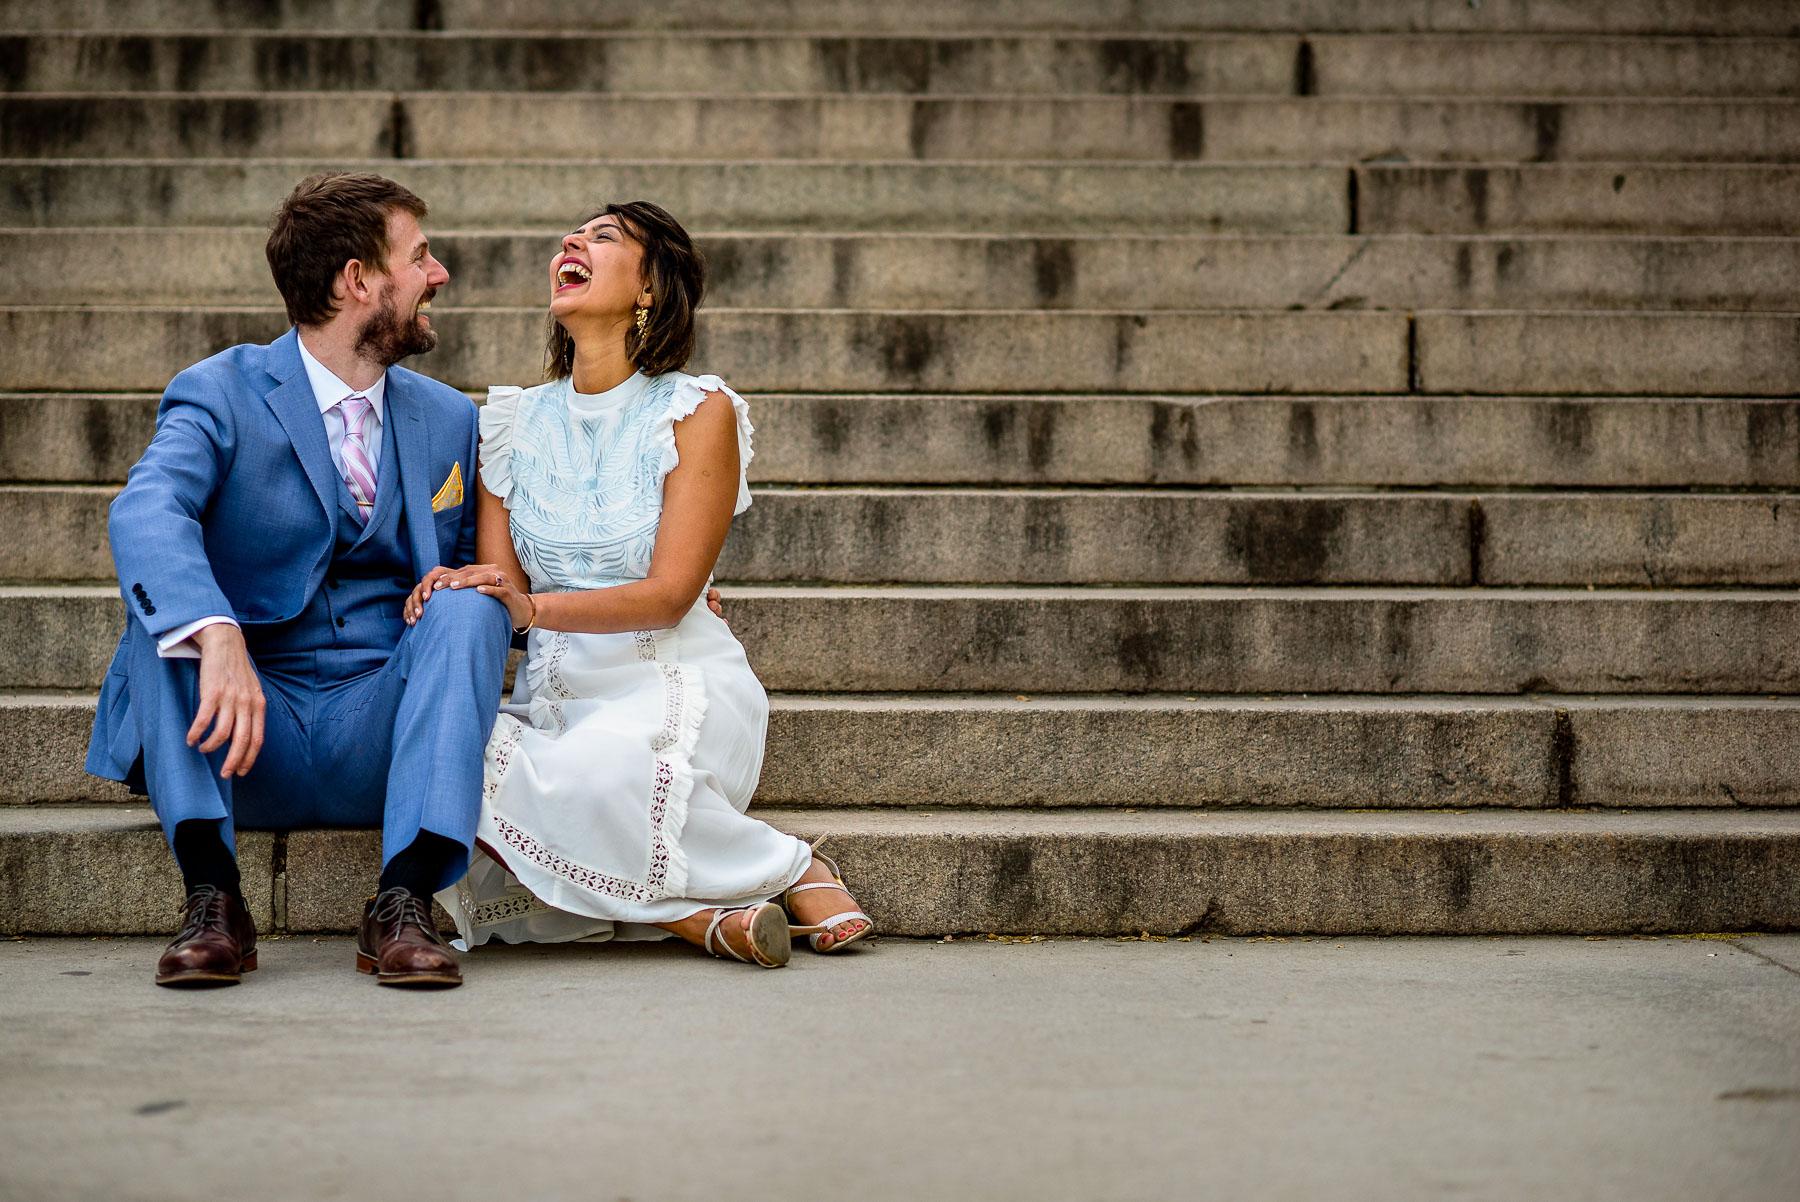 Central Park NYC Wedding portrait bethesda terrace steps